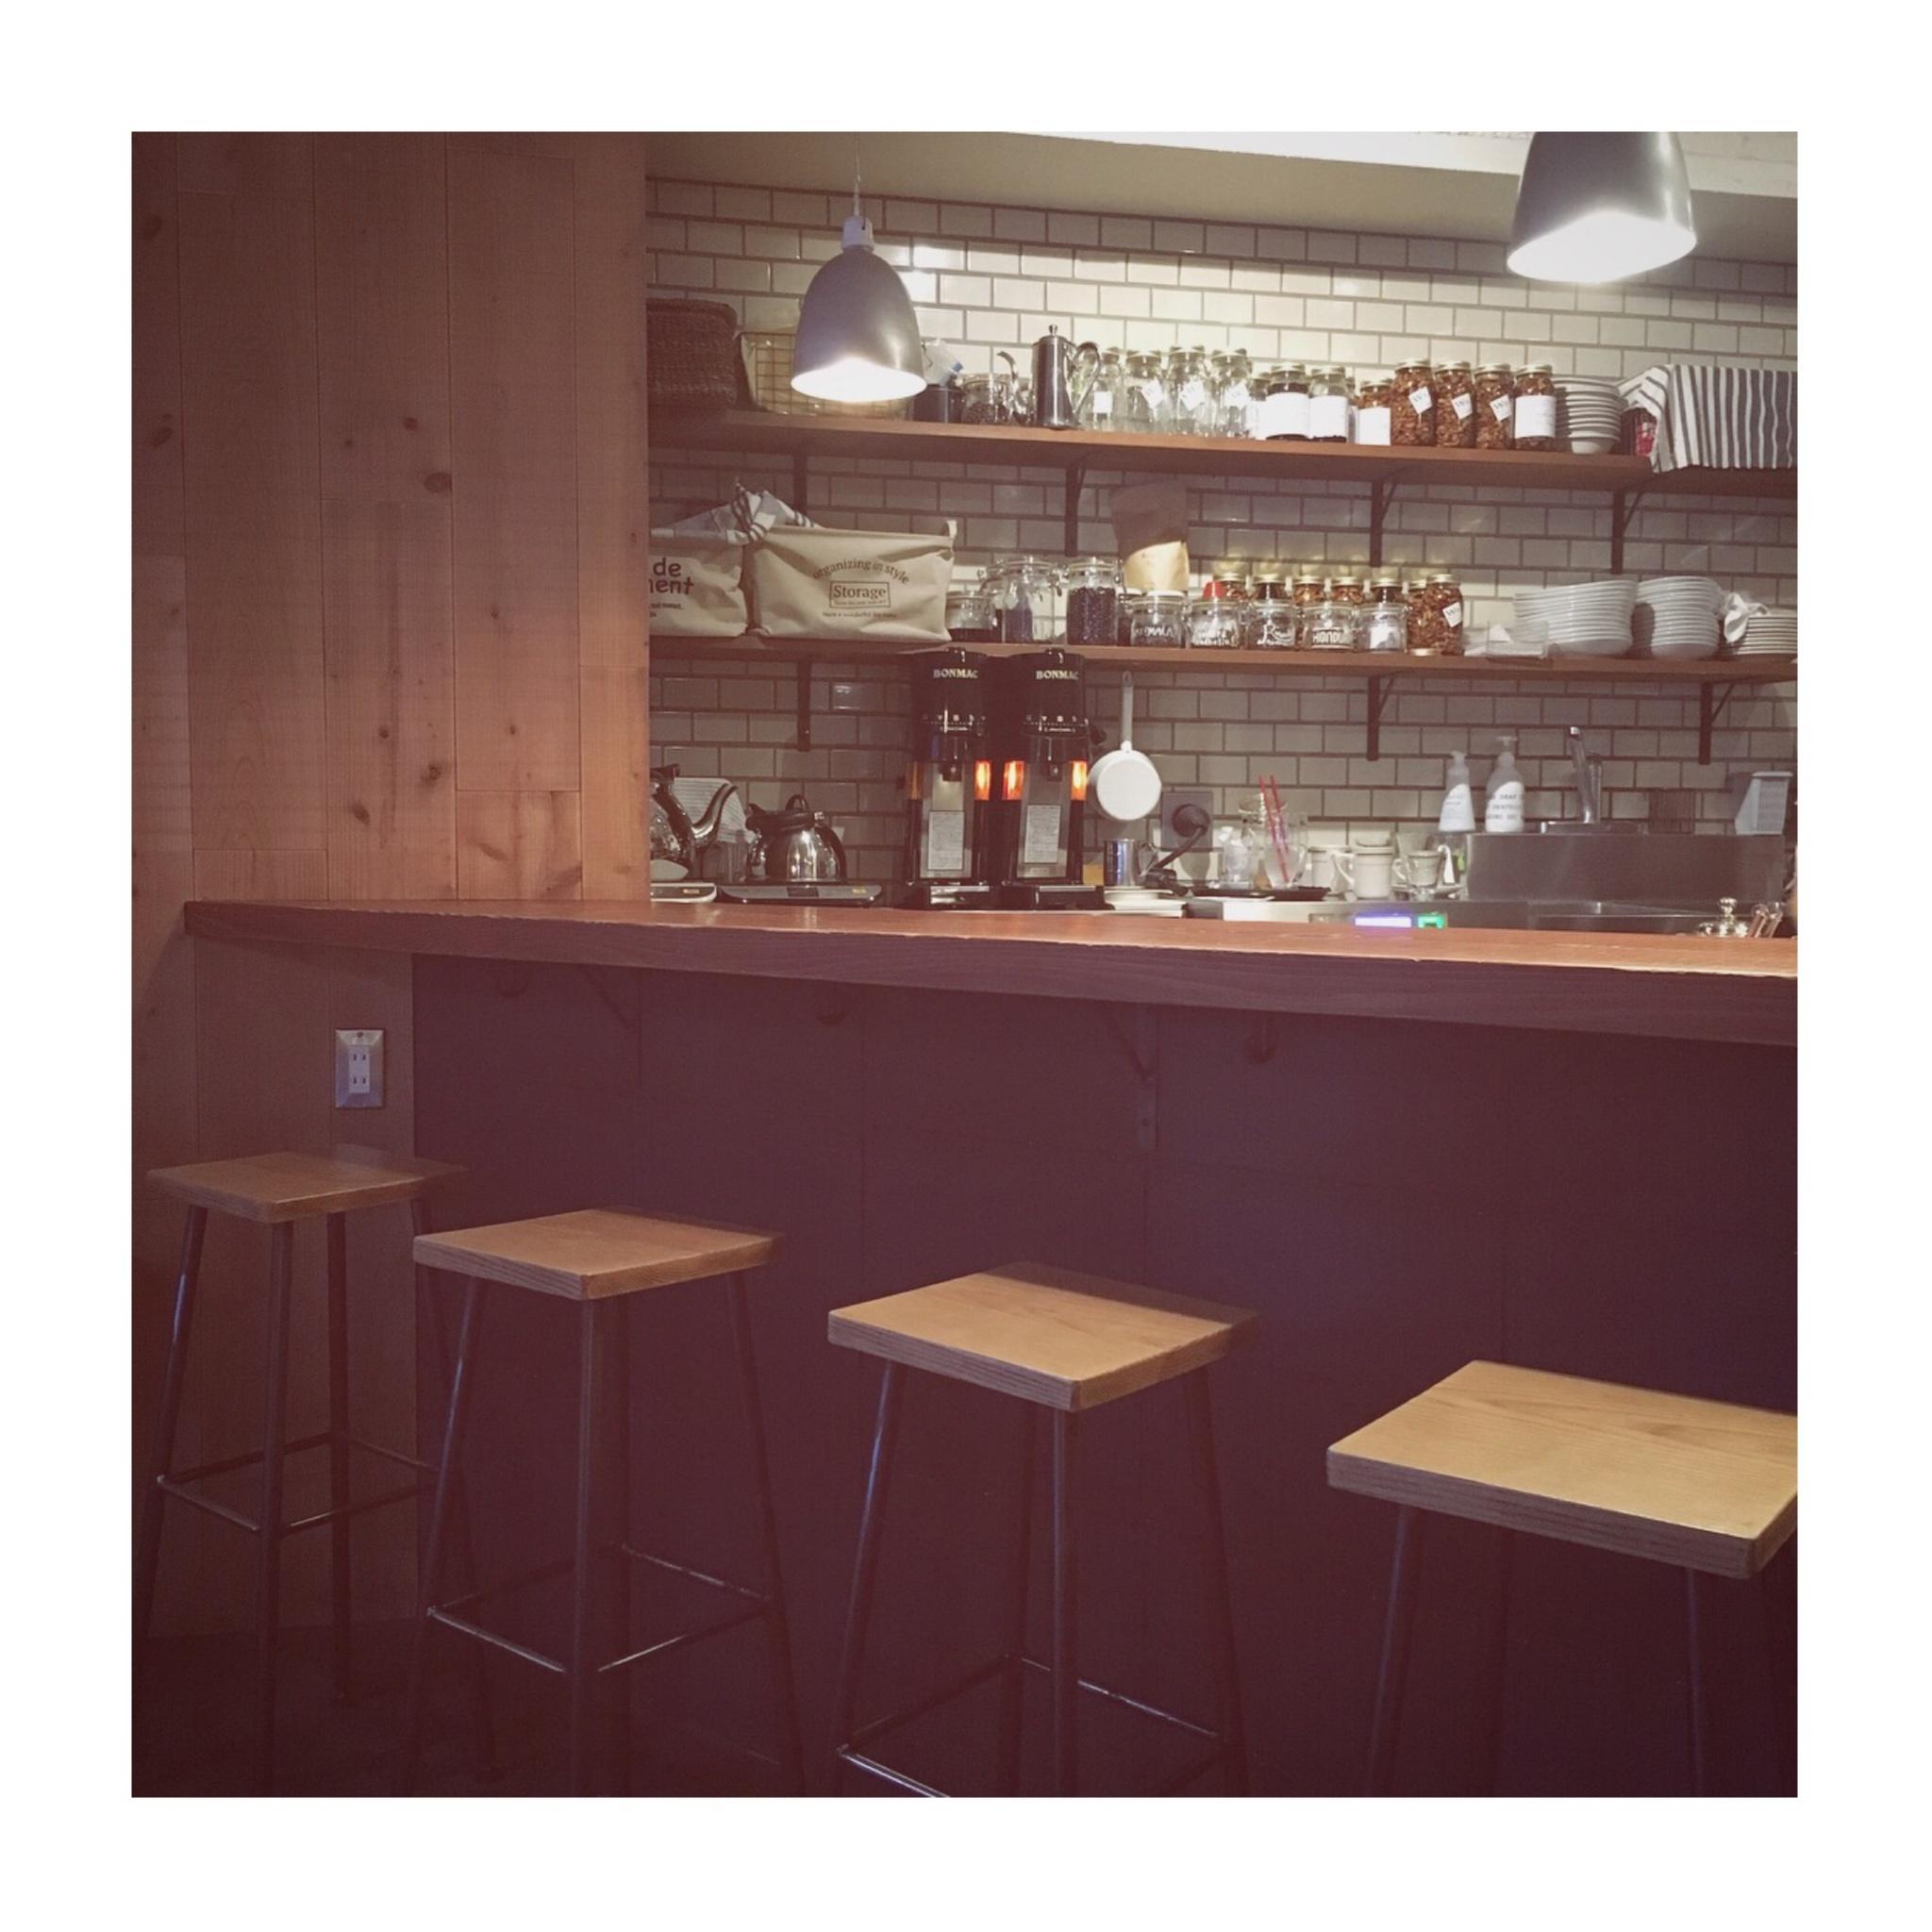 #7【#cafestagram】❤️:《大阪•梅田》バーのようなシックな空間で落ち着くカフェタイムを*「whitebird coffee stand」☻_2